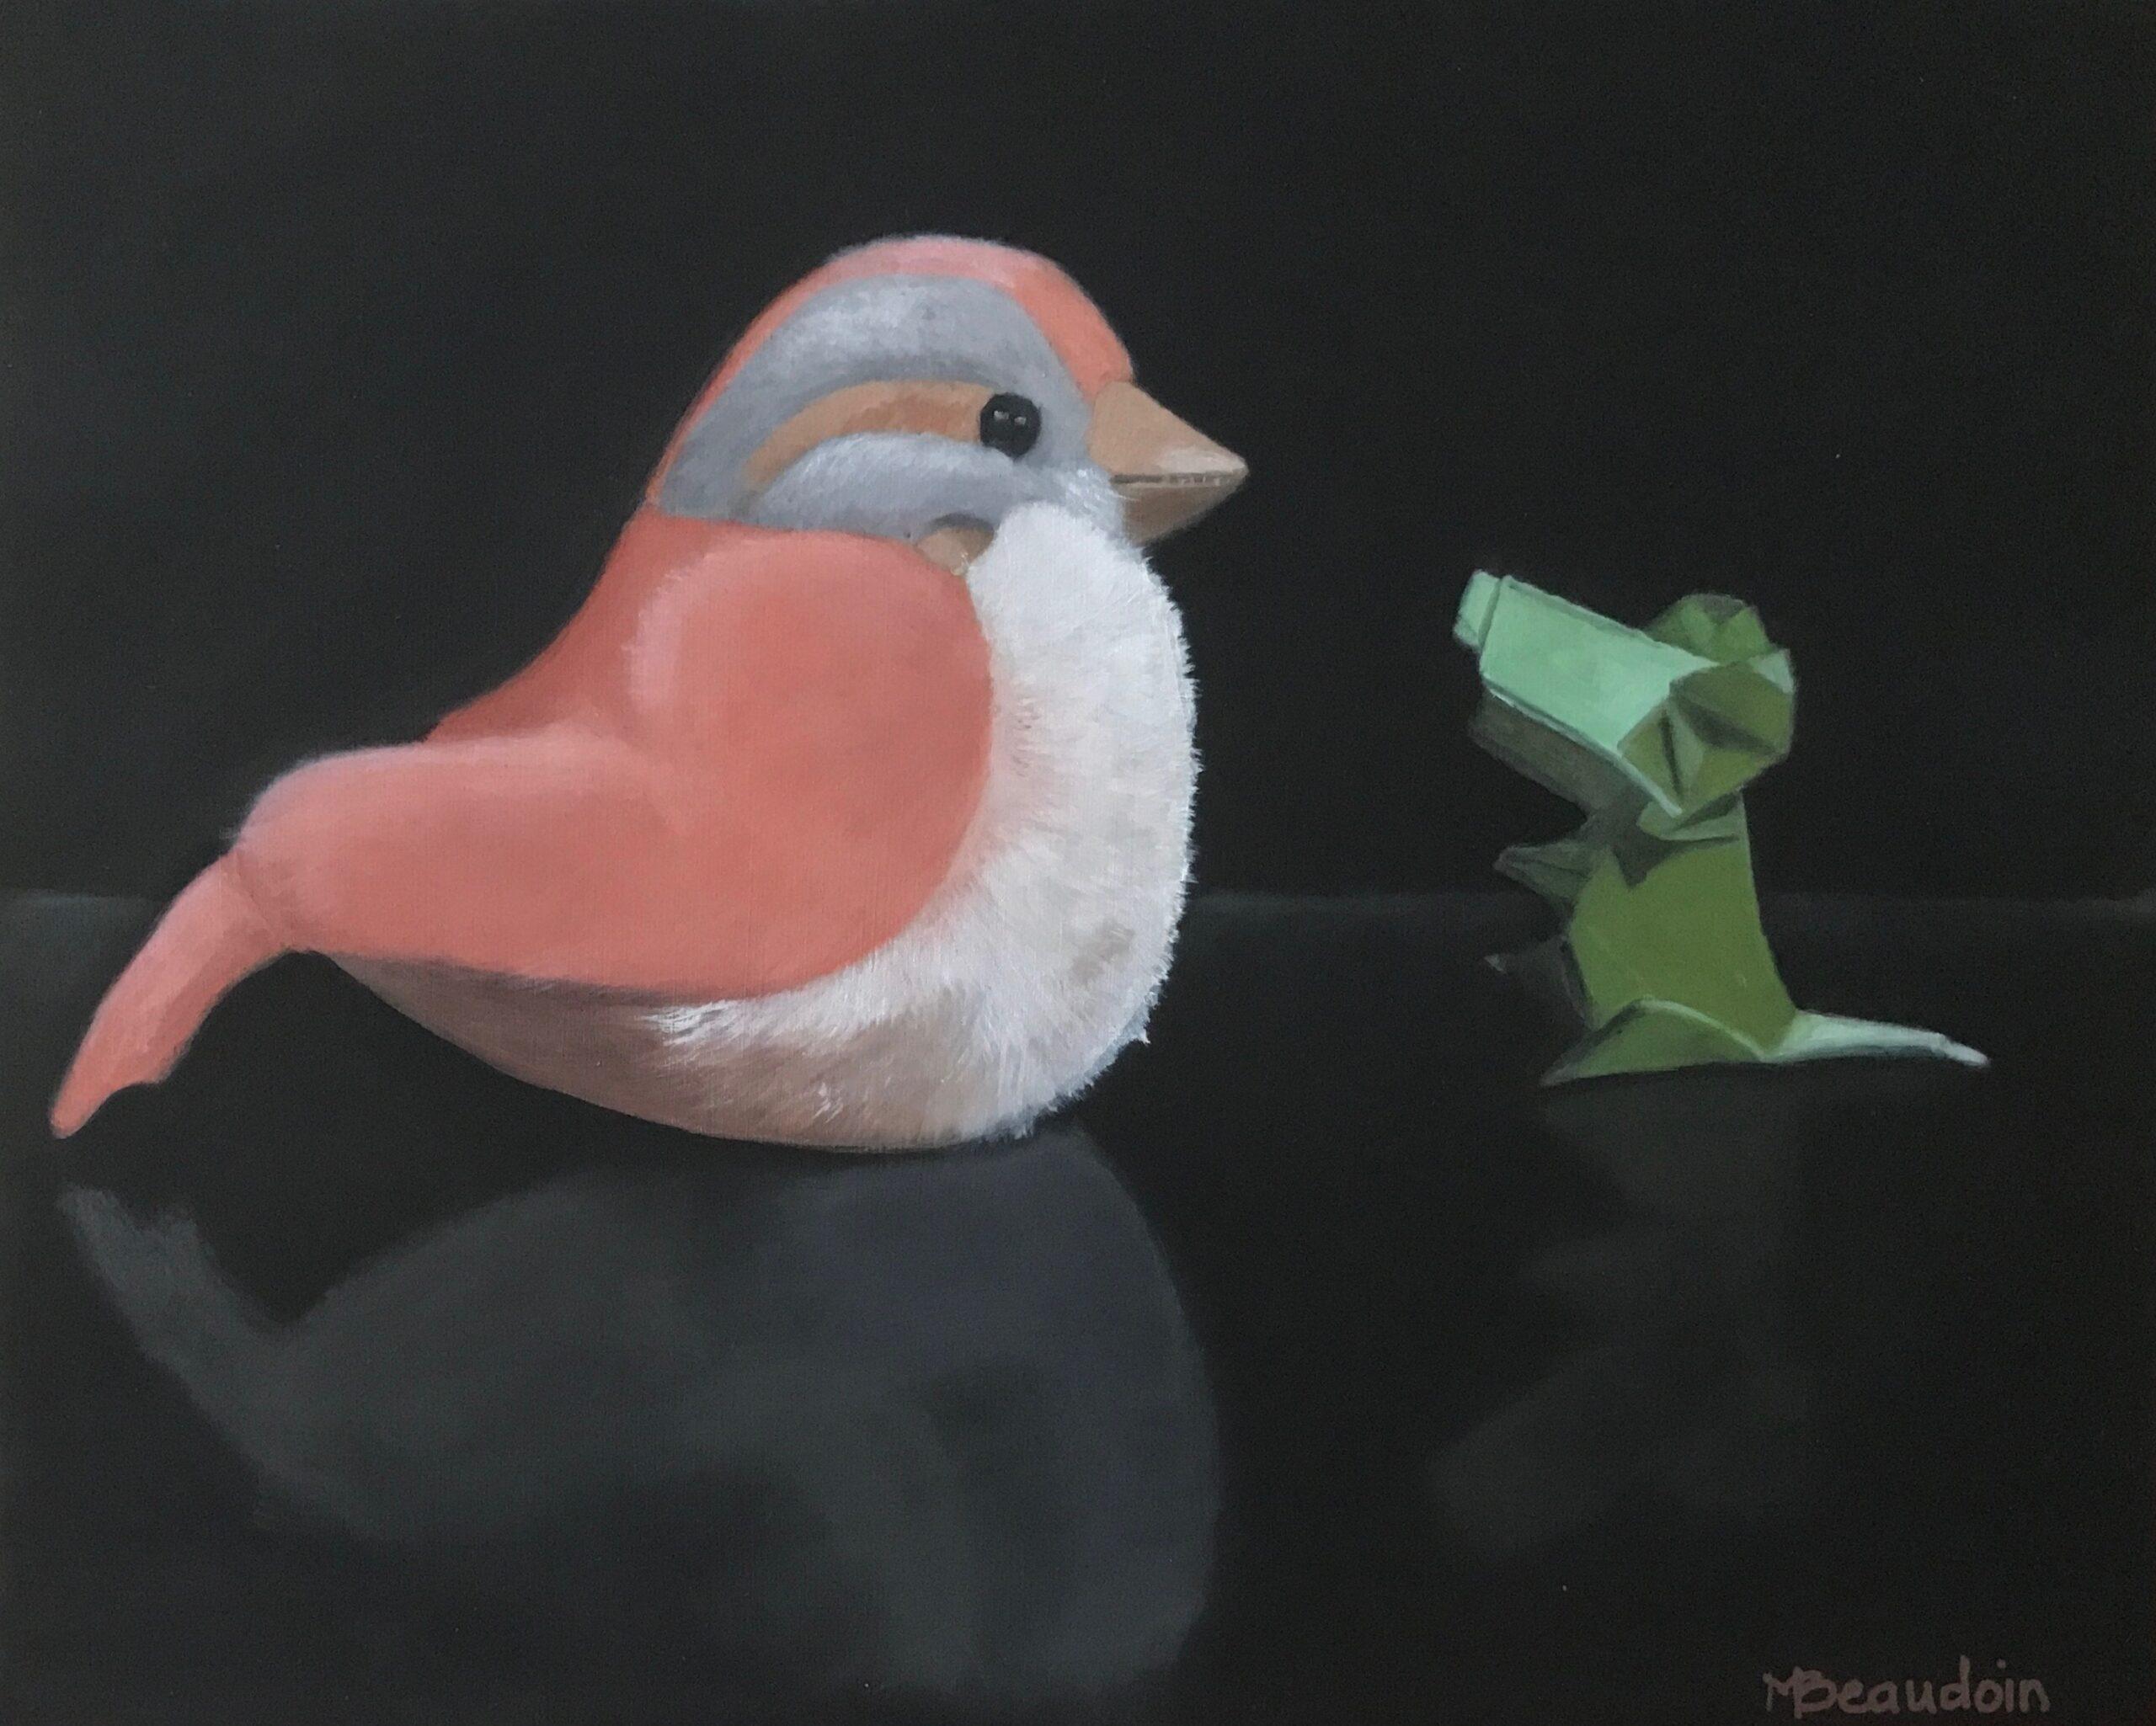 L'oiseau en peluche et la souris verte / Stuffed bird and the green mouse